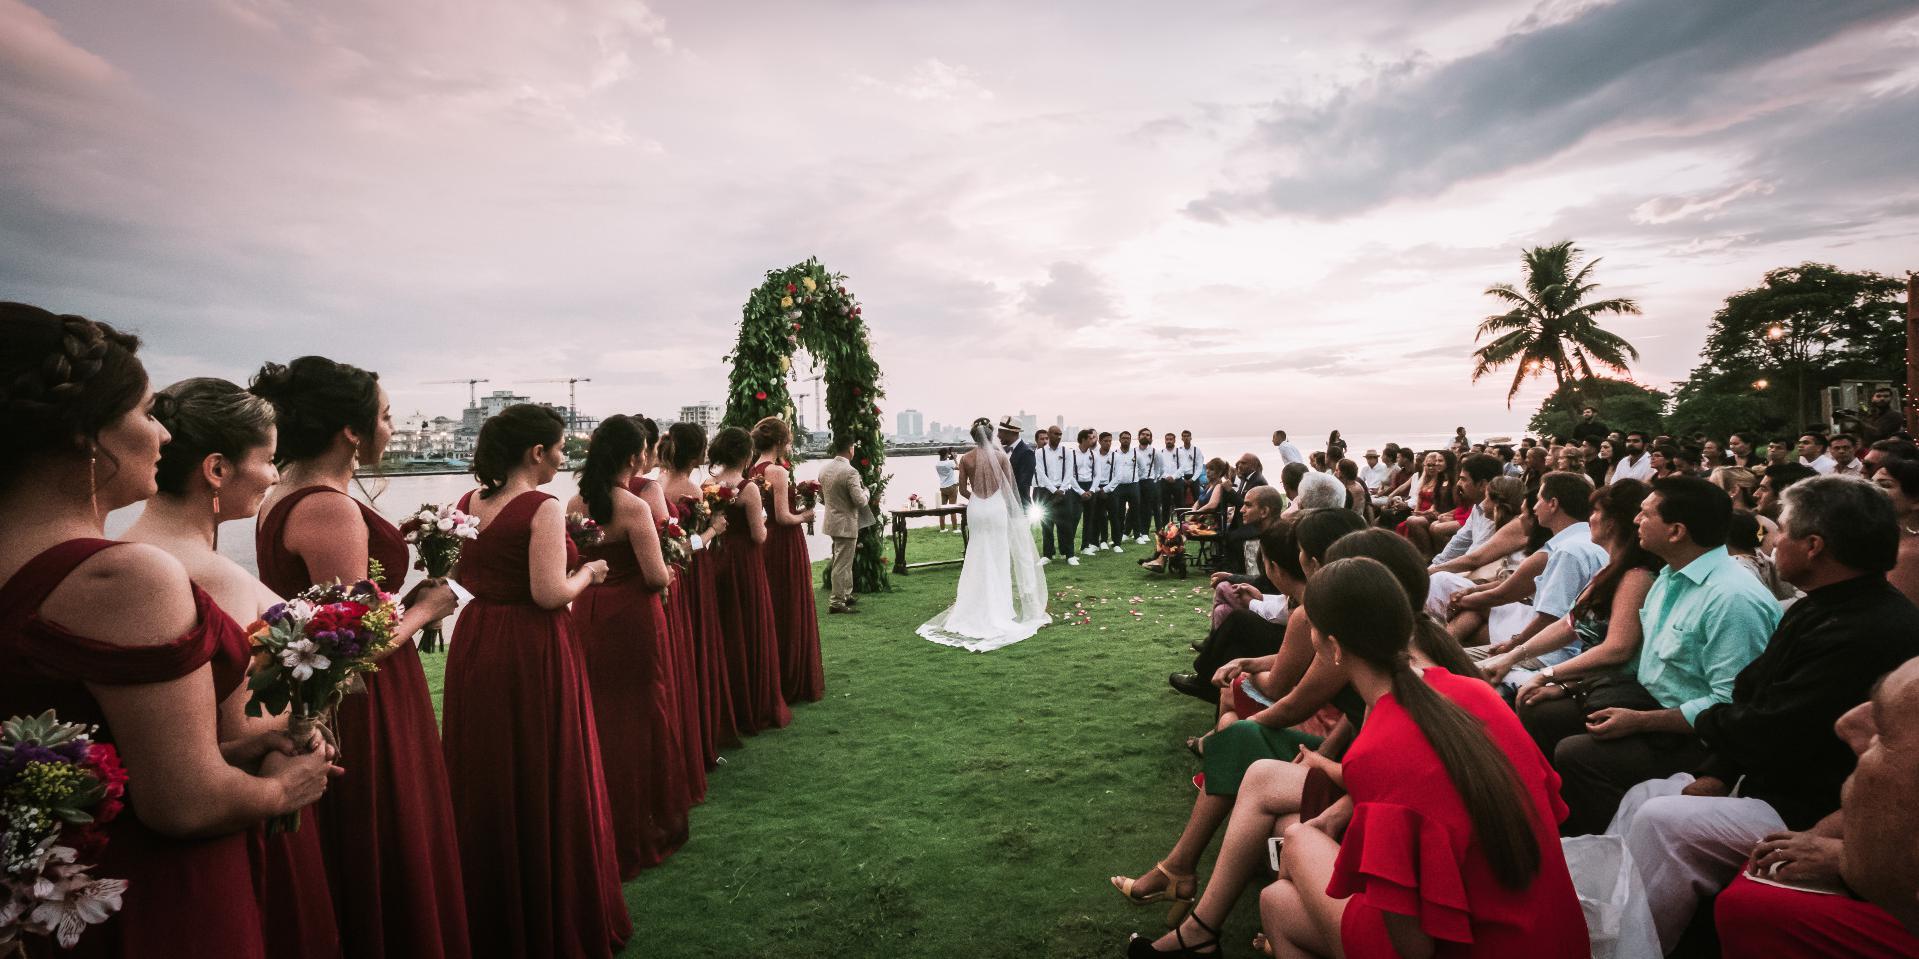 bodas-sin-clasificar-sin-tema-cuba-29301.jpg